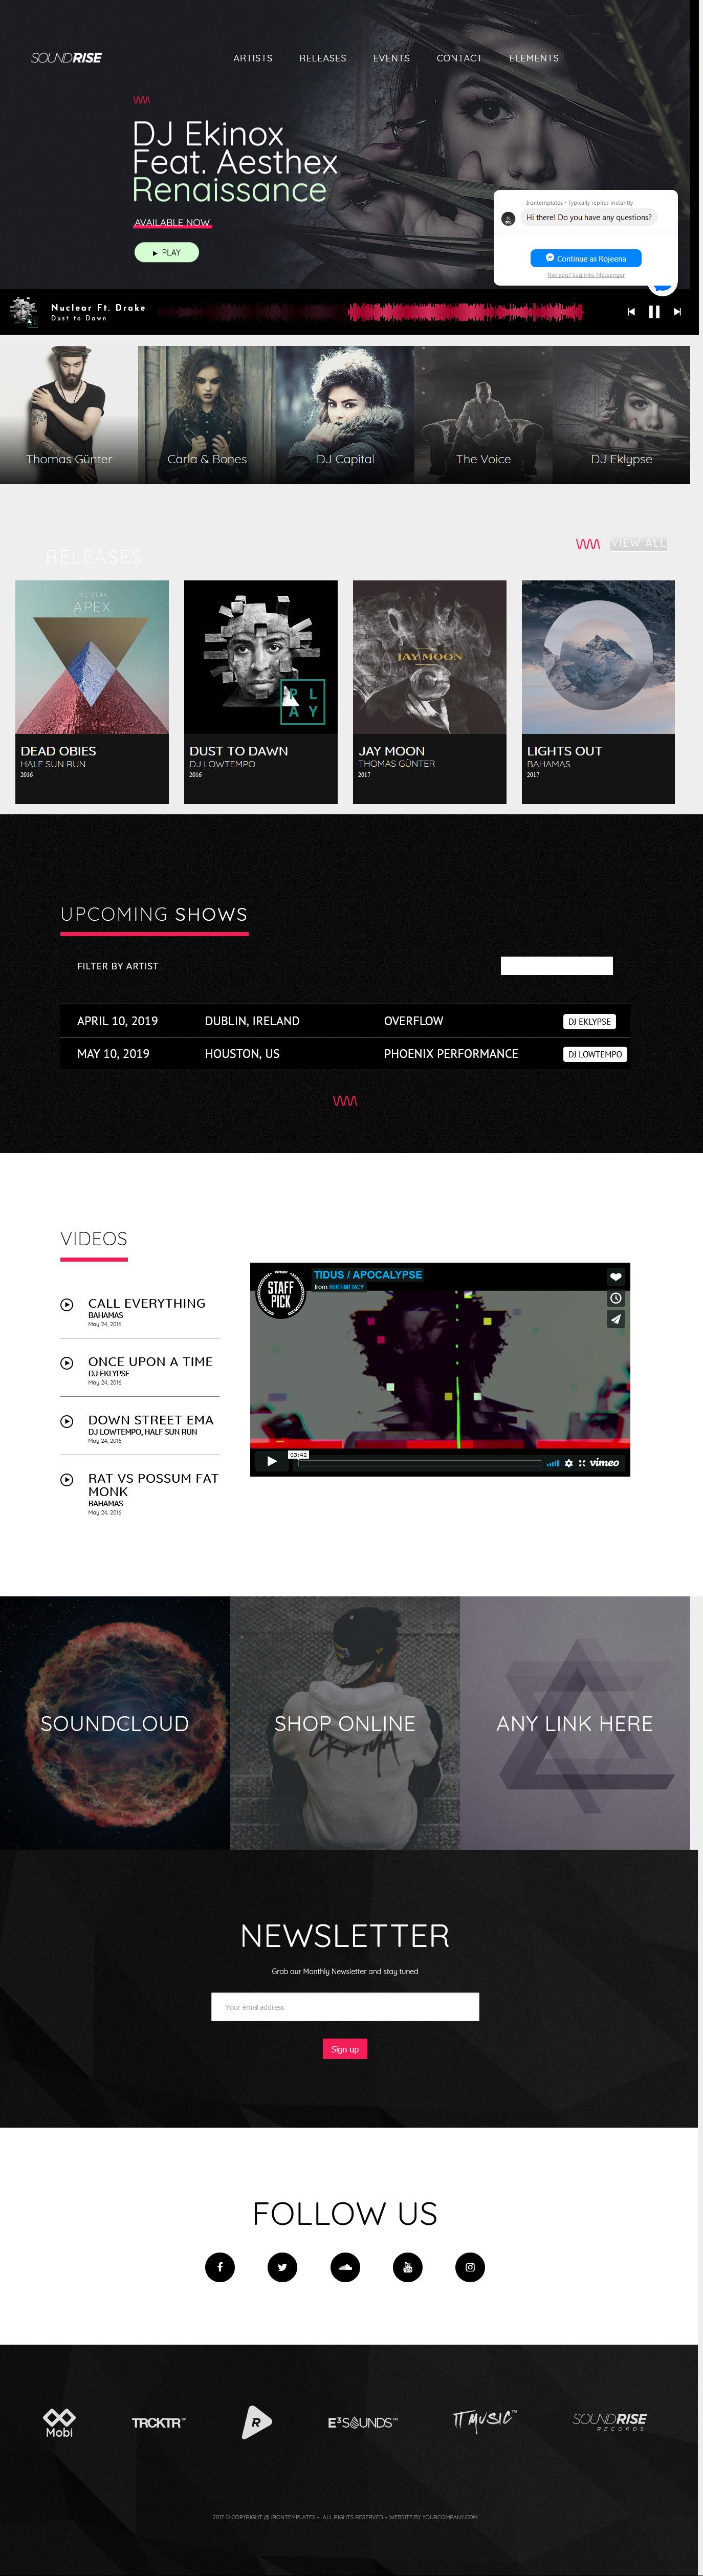 SoundRise - Best Premium Video and Music WordPress Theme